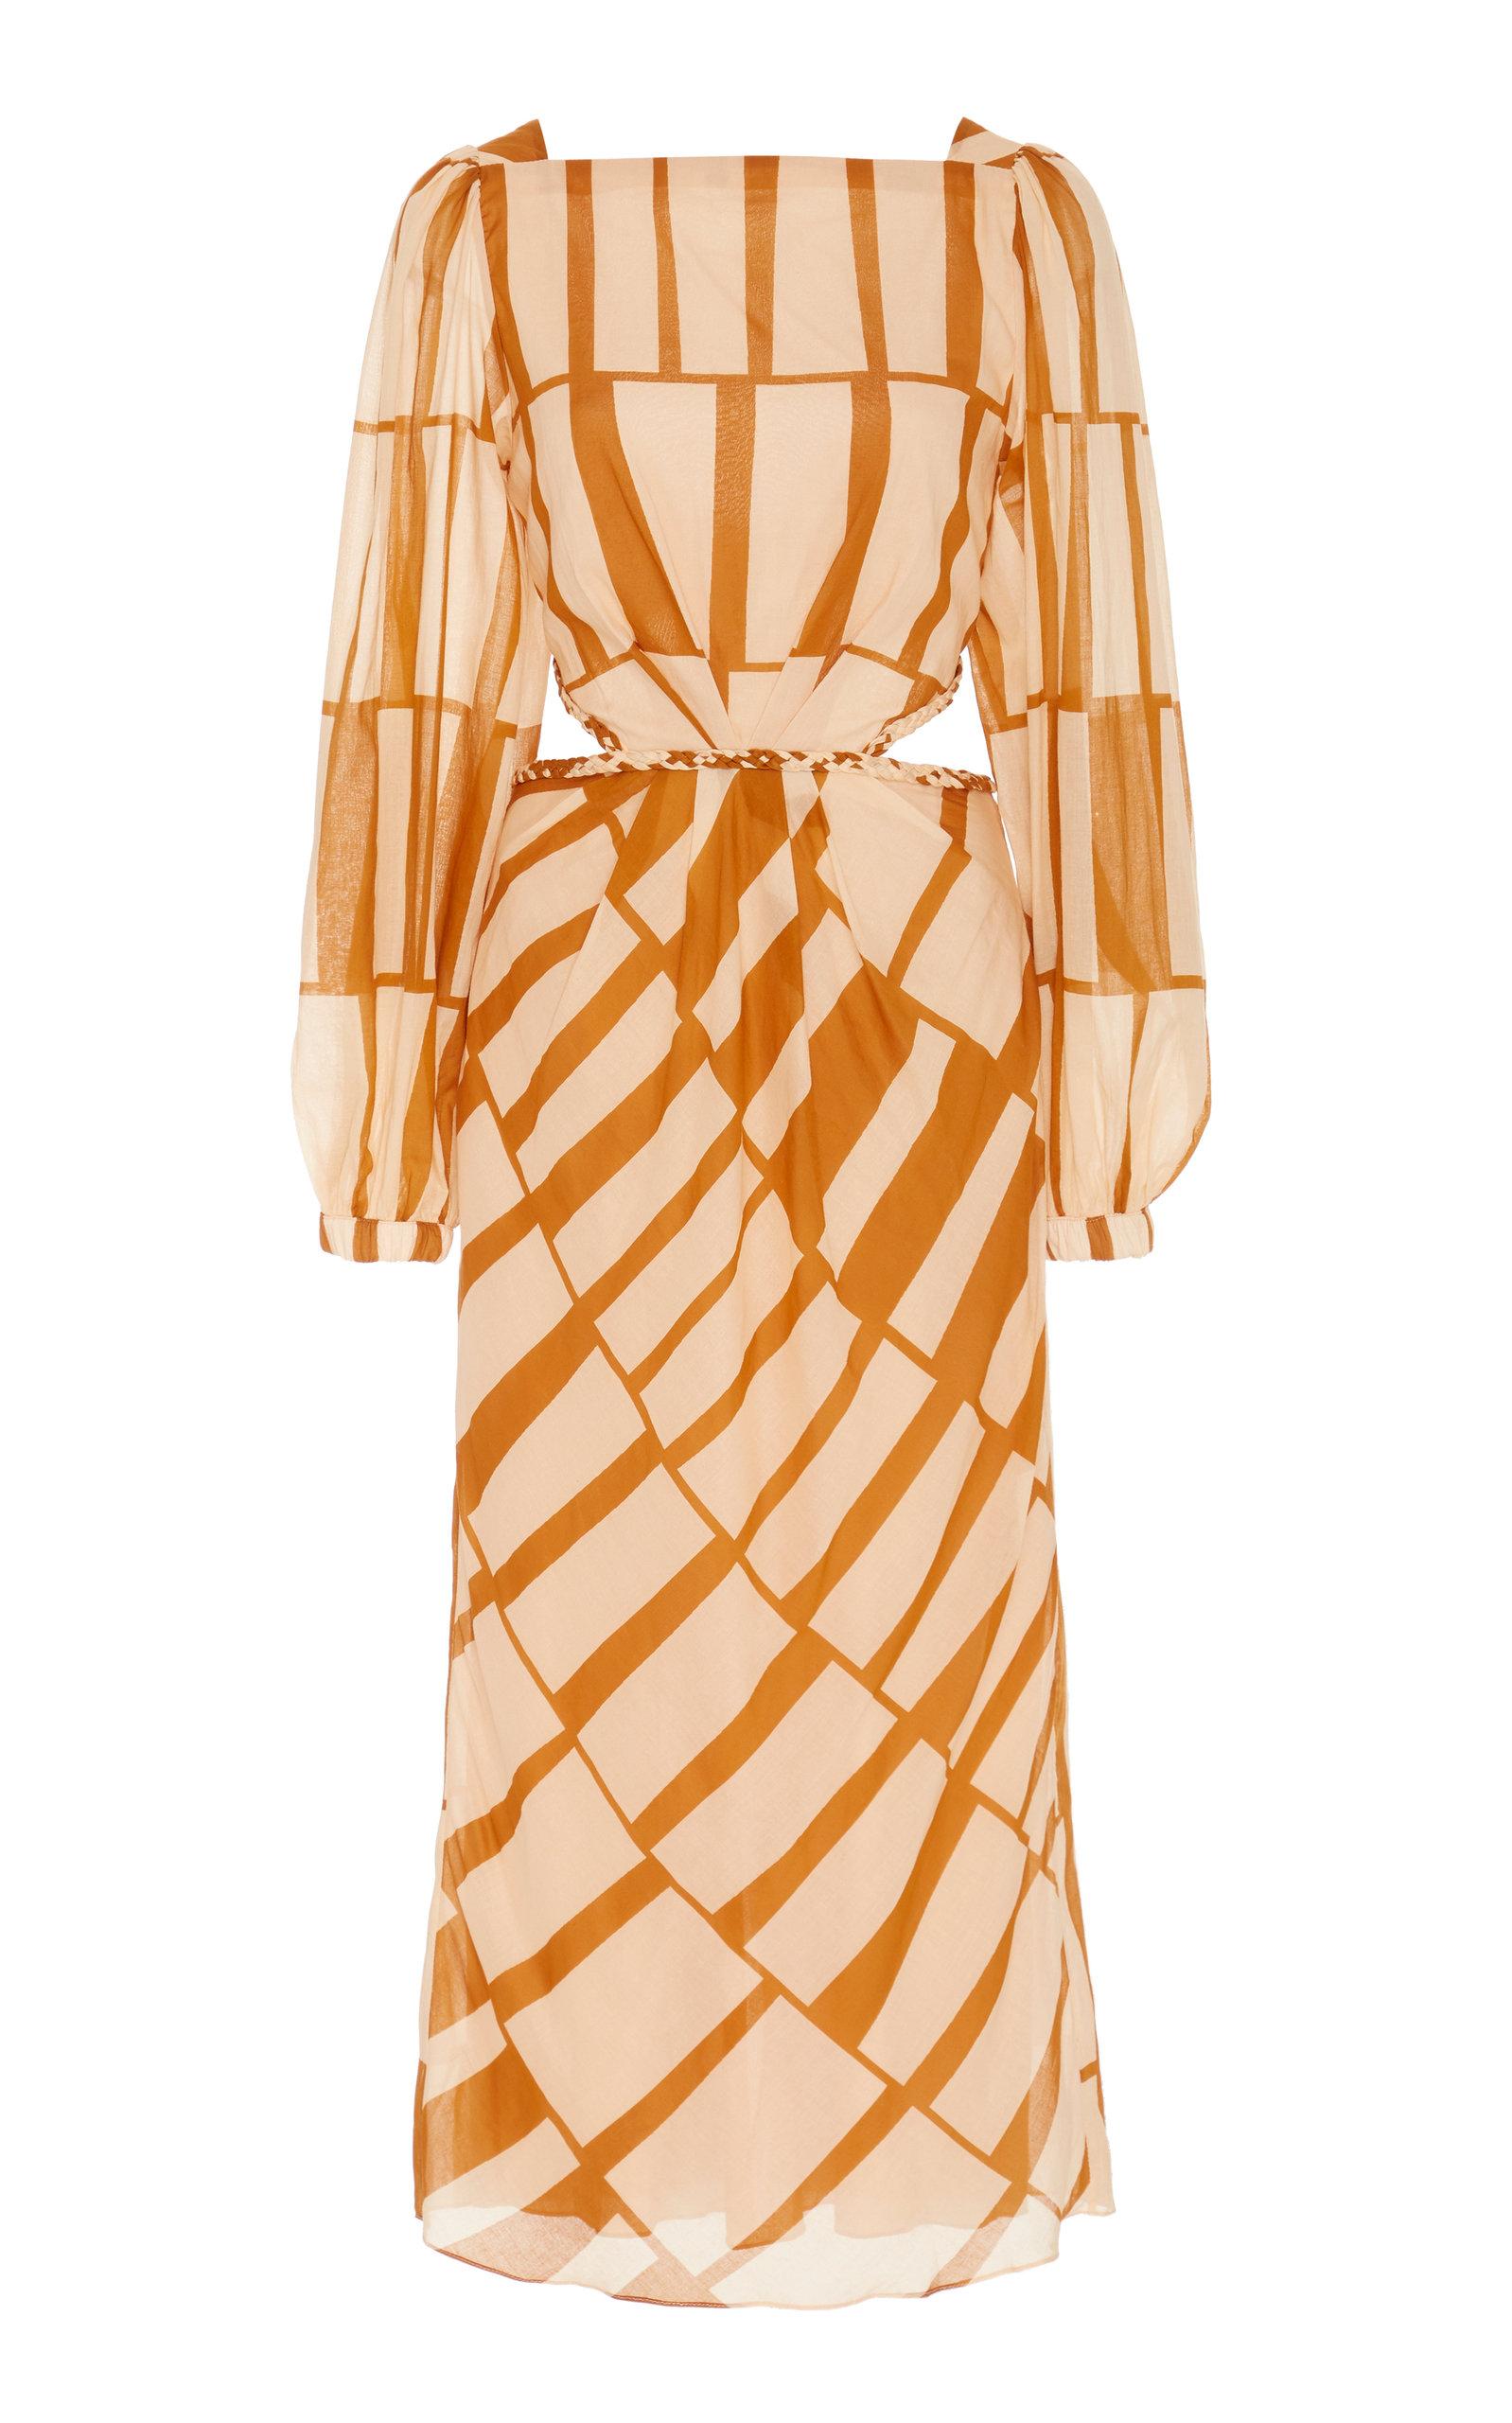 Buy Johanna Ortiz Illusion Of Time Cotton Cutout Midi Dress online, shop Johanna Ortiz at the best price